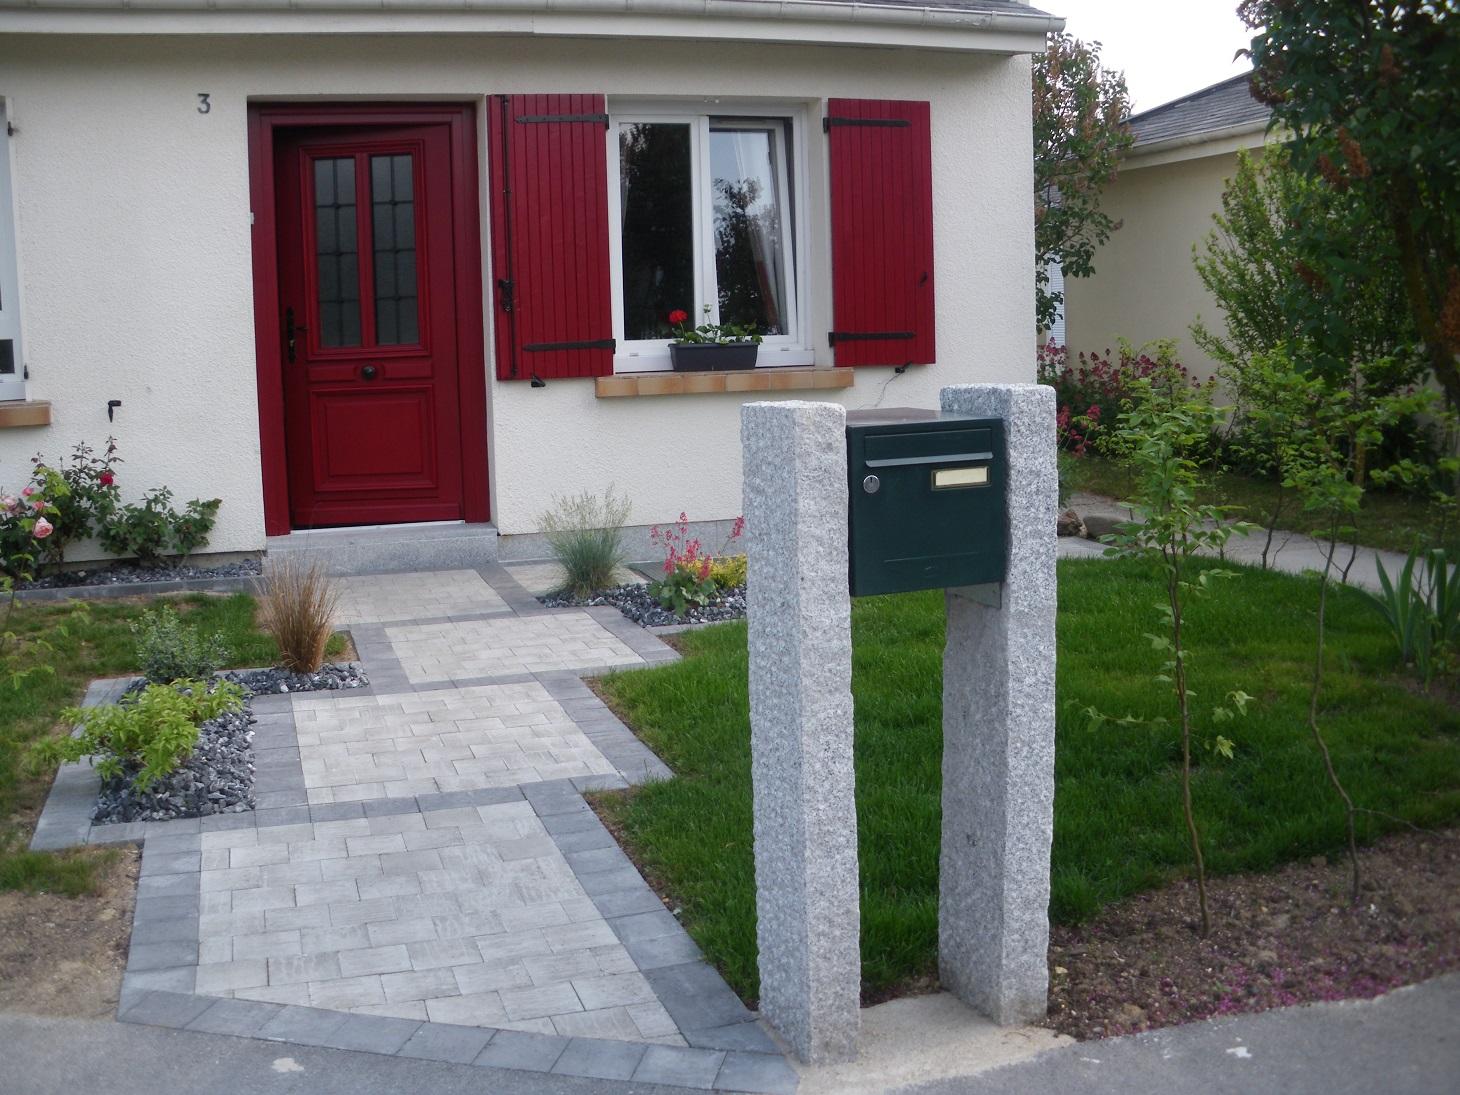 Paysagiste entree de maison stunning jardin duentre with for Jardin entree maison